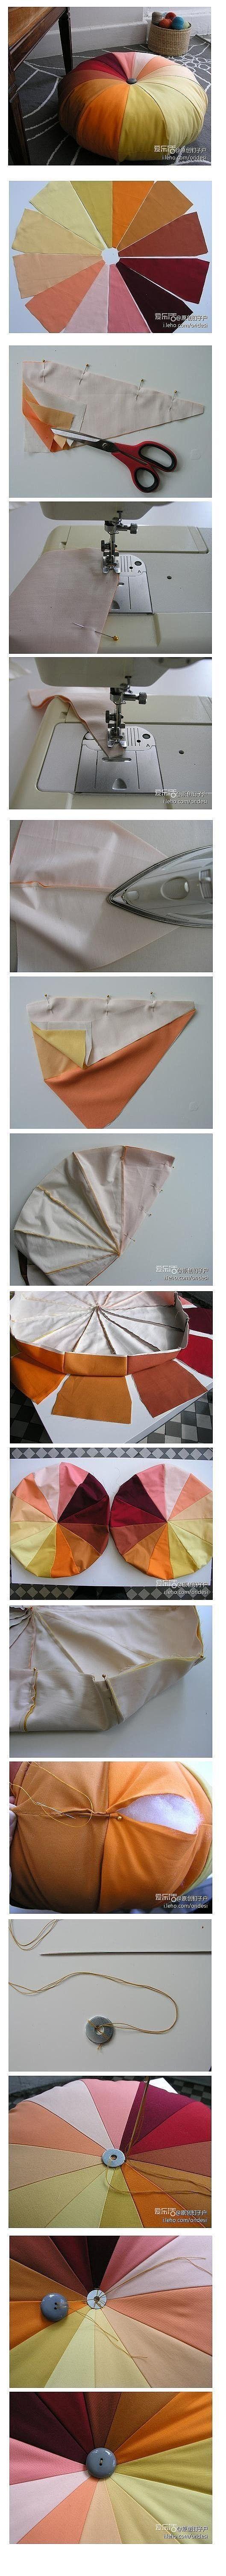 DIY cute cushion | DiyReal.com